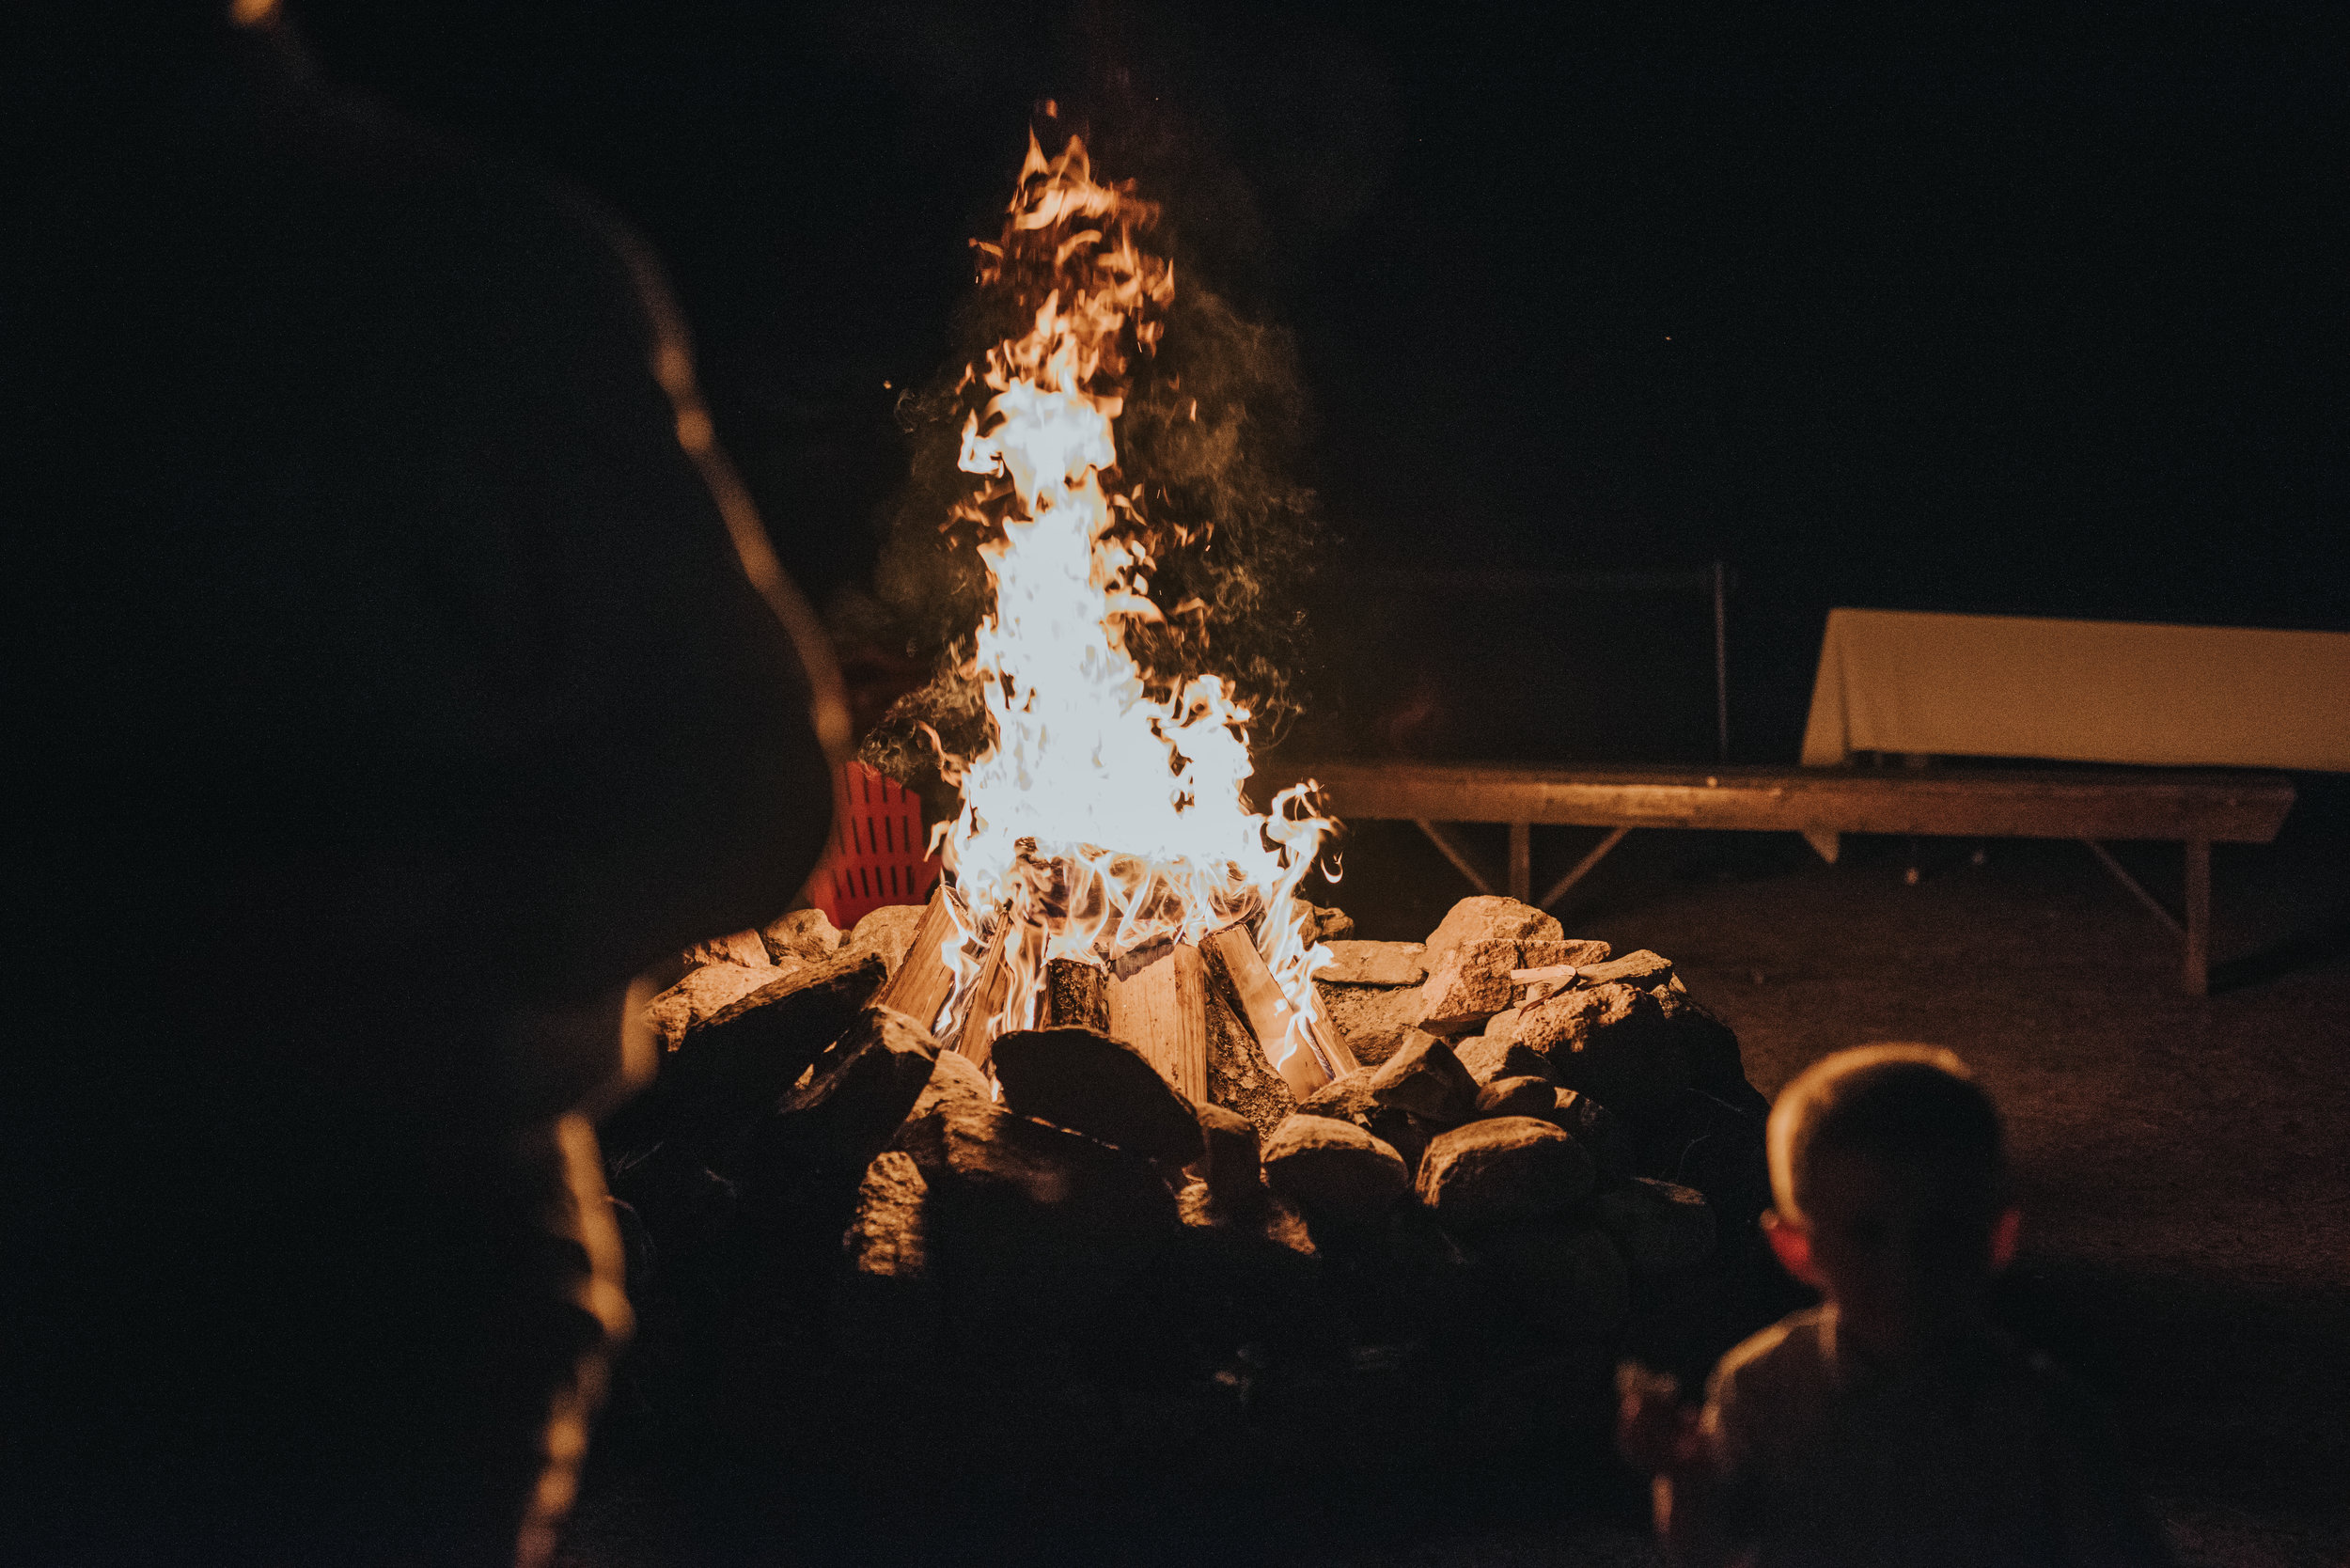 bonfire-rustic-cabin-wedding-reception-toronto-bohemian-boho-outdoor-summer-wedding-documentary-wedding-photography-by-willow-birch-photo.jpg